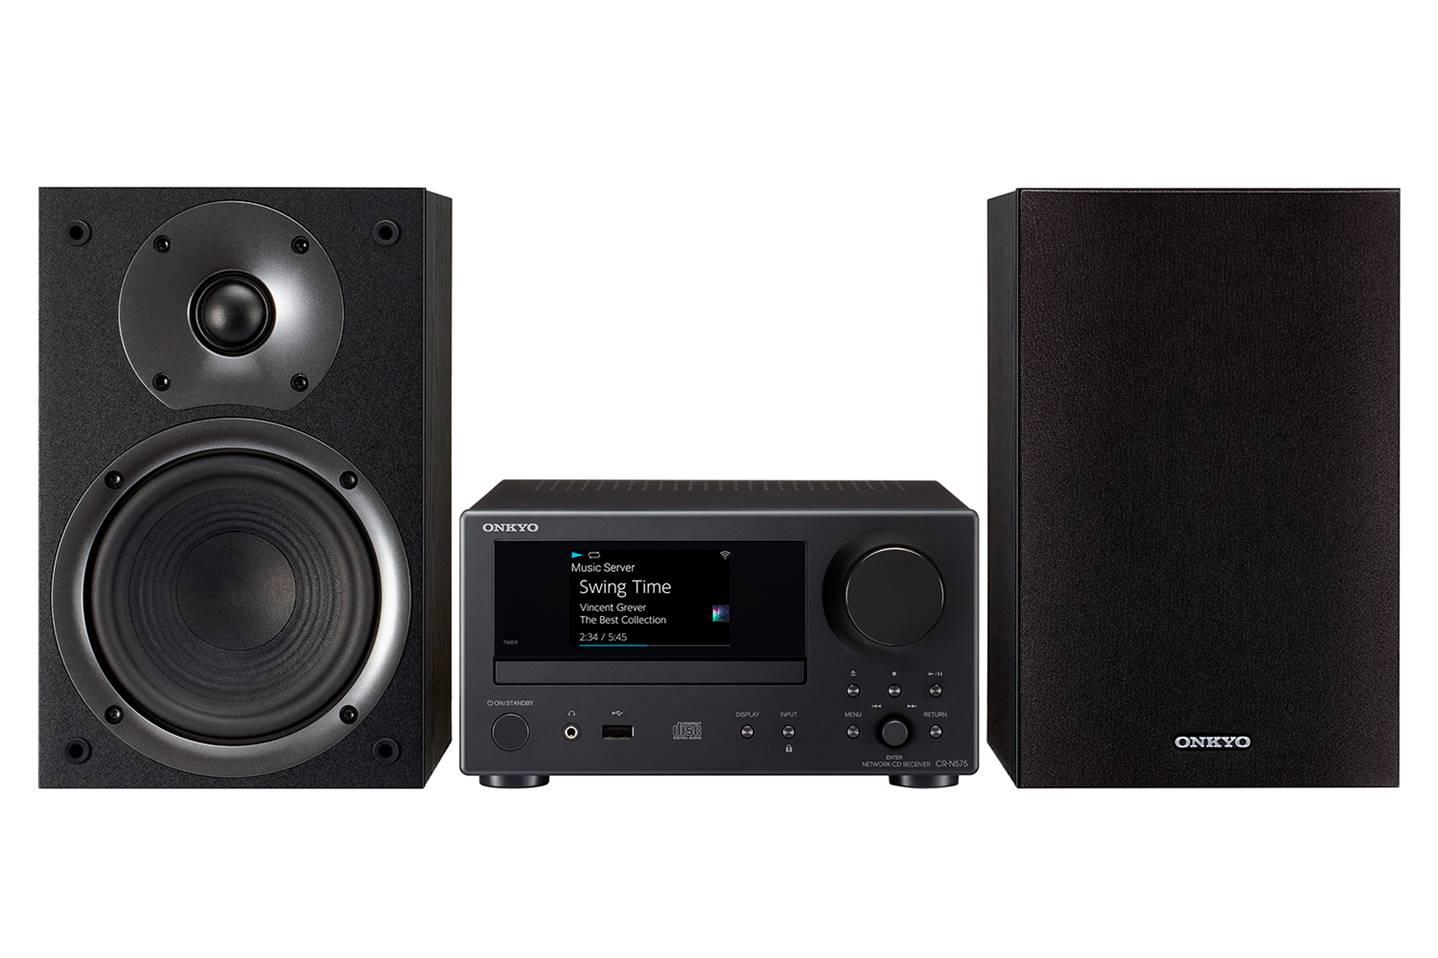 Onkyo CS-N575 Hi-Fi System